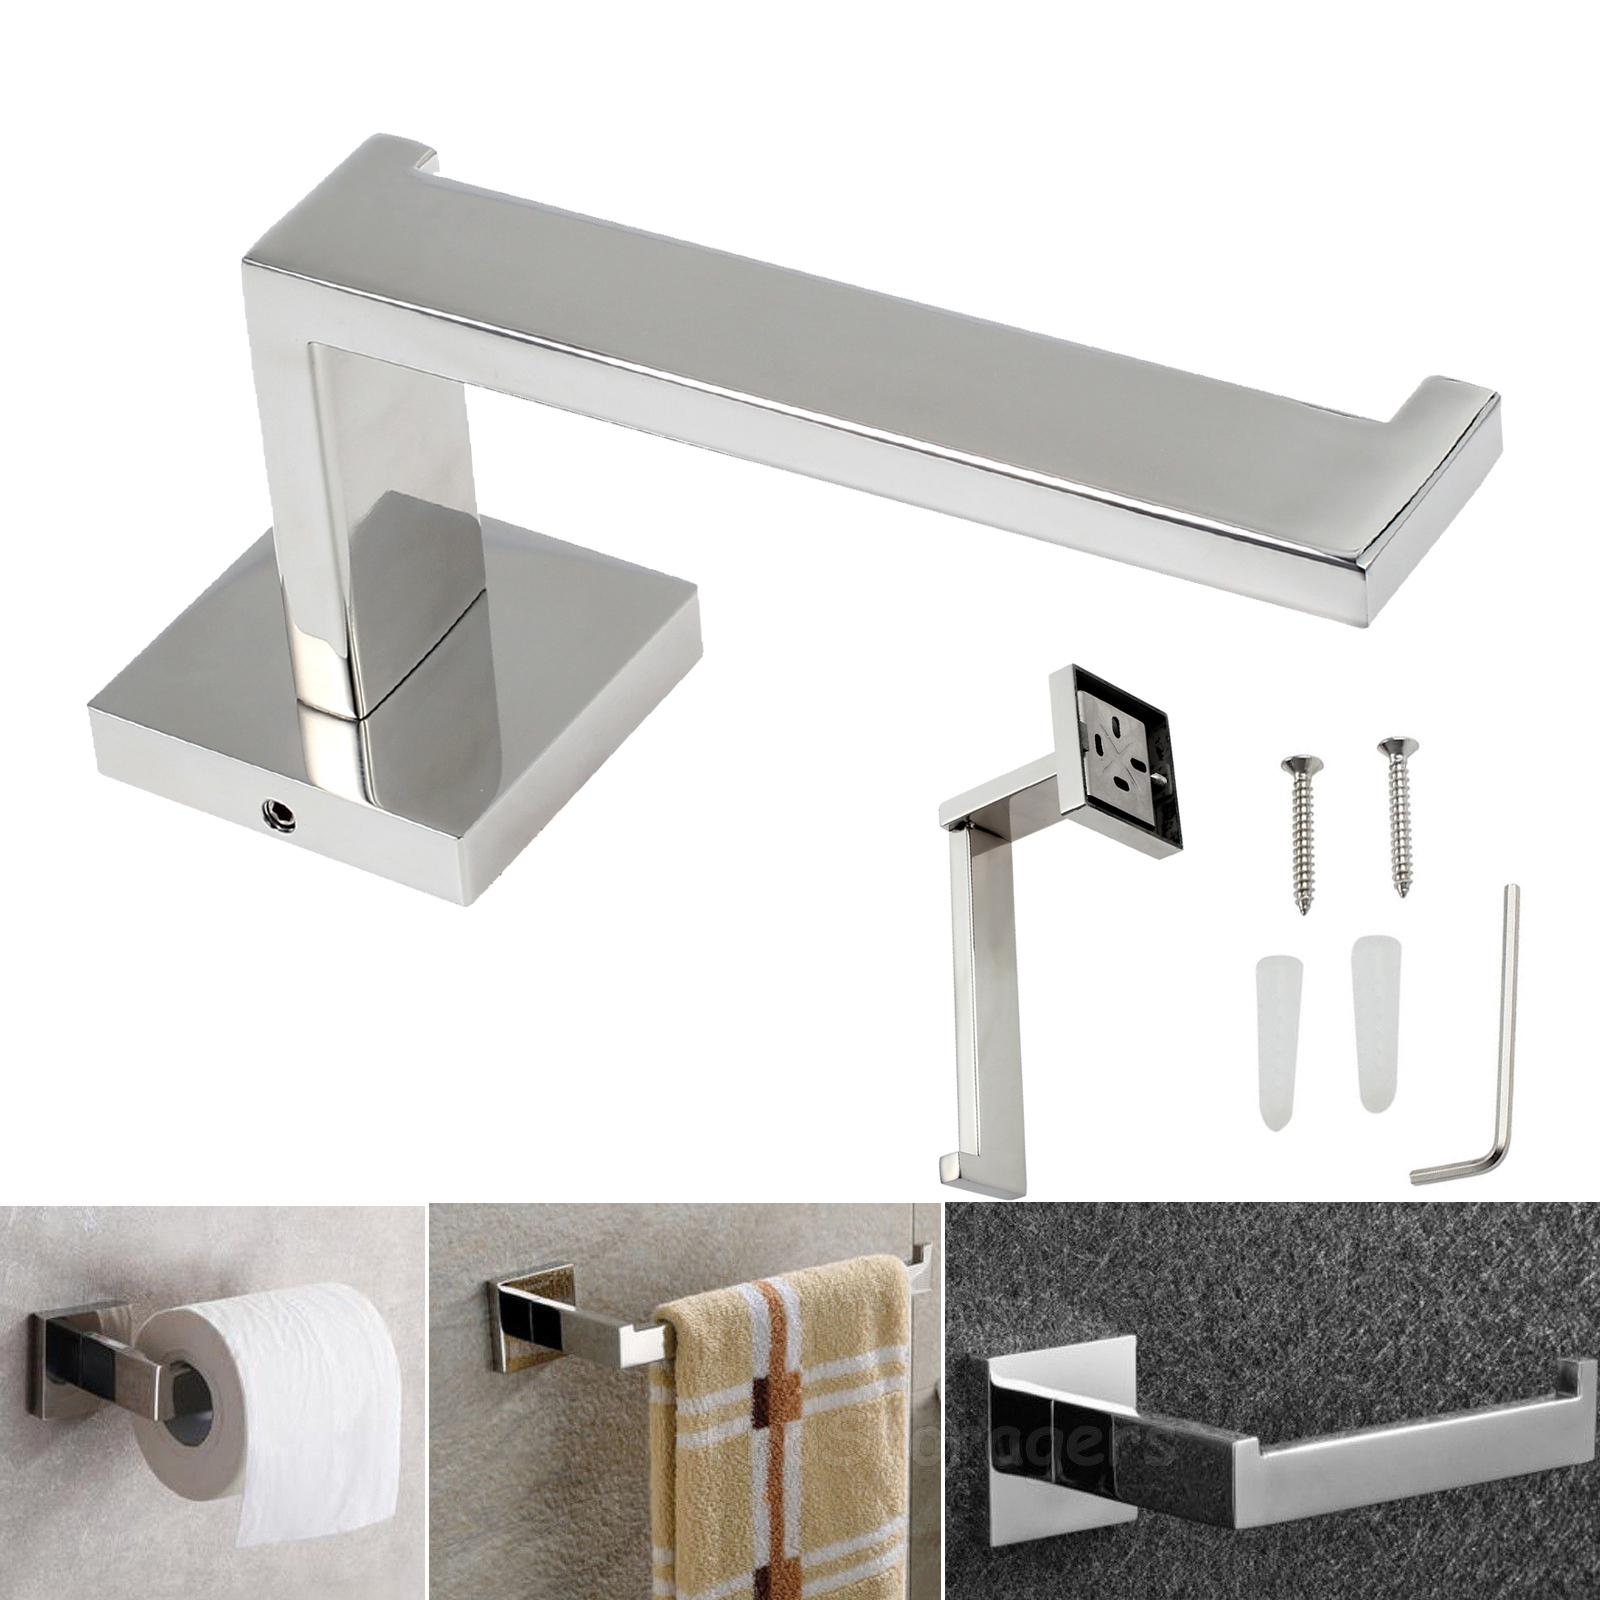 toilettenpapierhalter wand klorollenhalter klopapierhalter papierrollenhalter de ebay. Black Bedroom Furniture Sets. Home Design Ideas